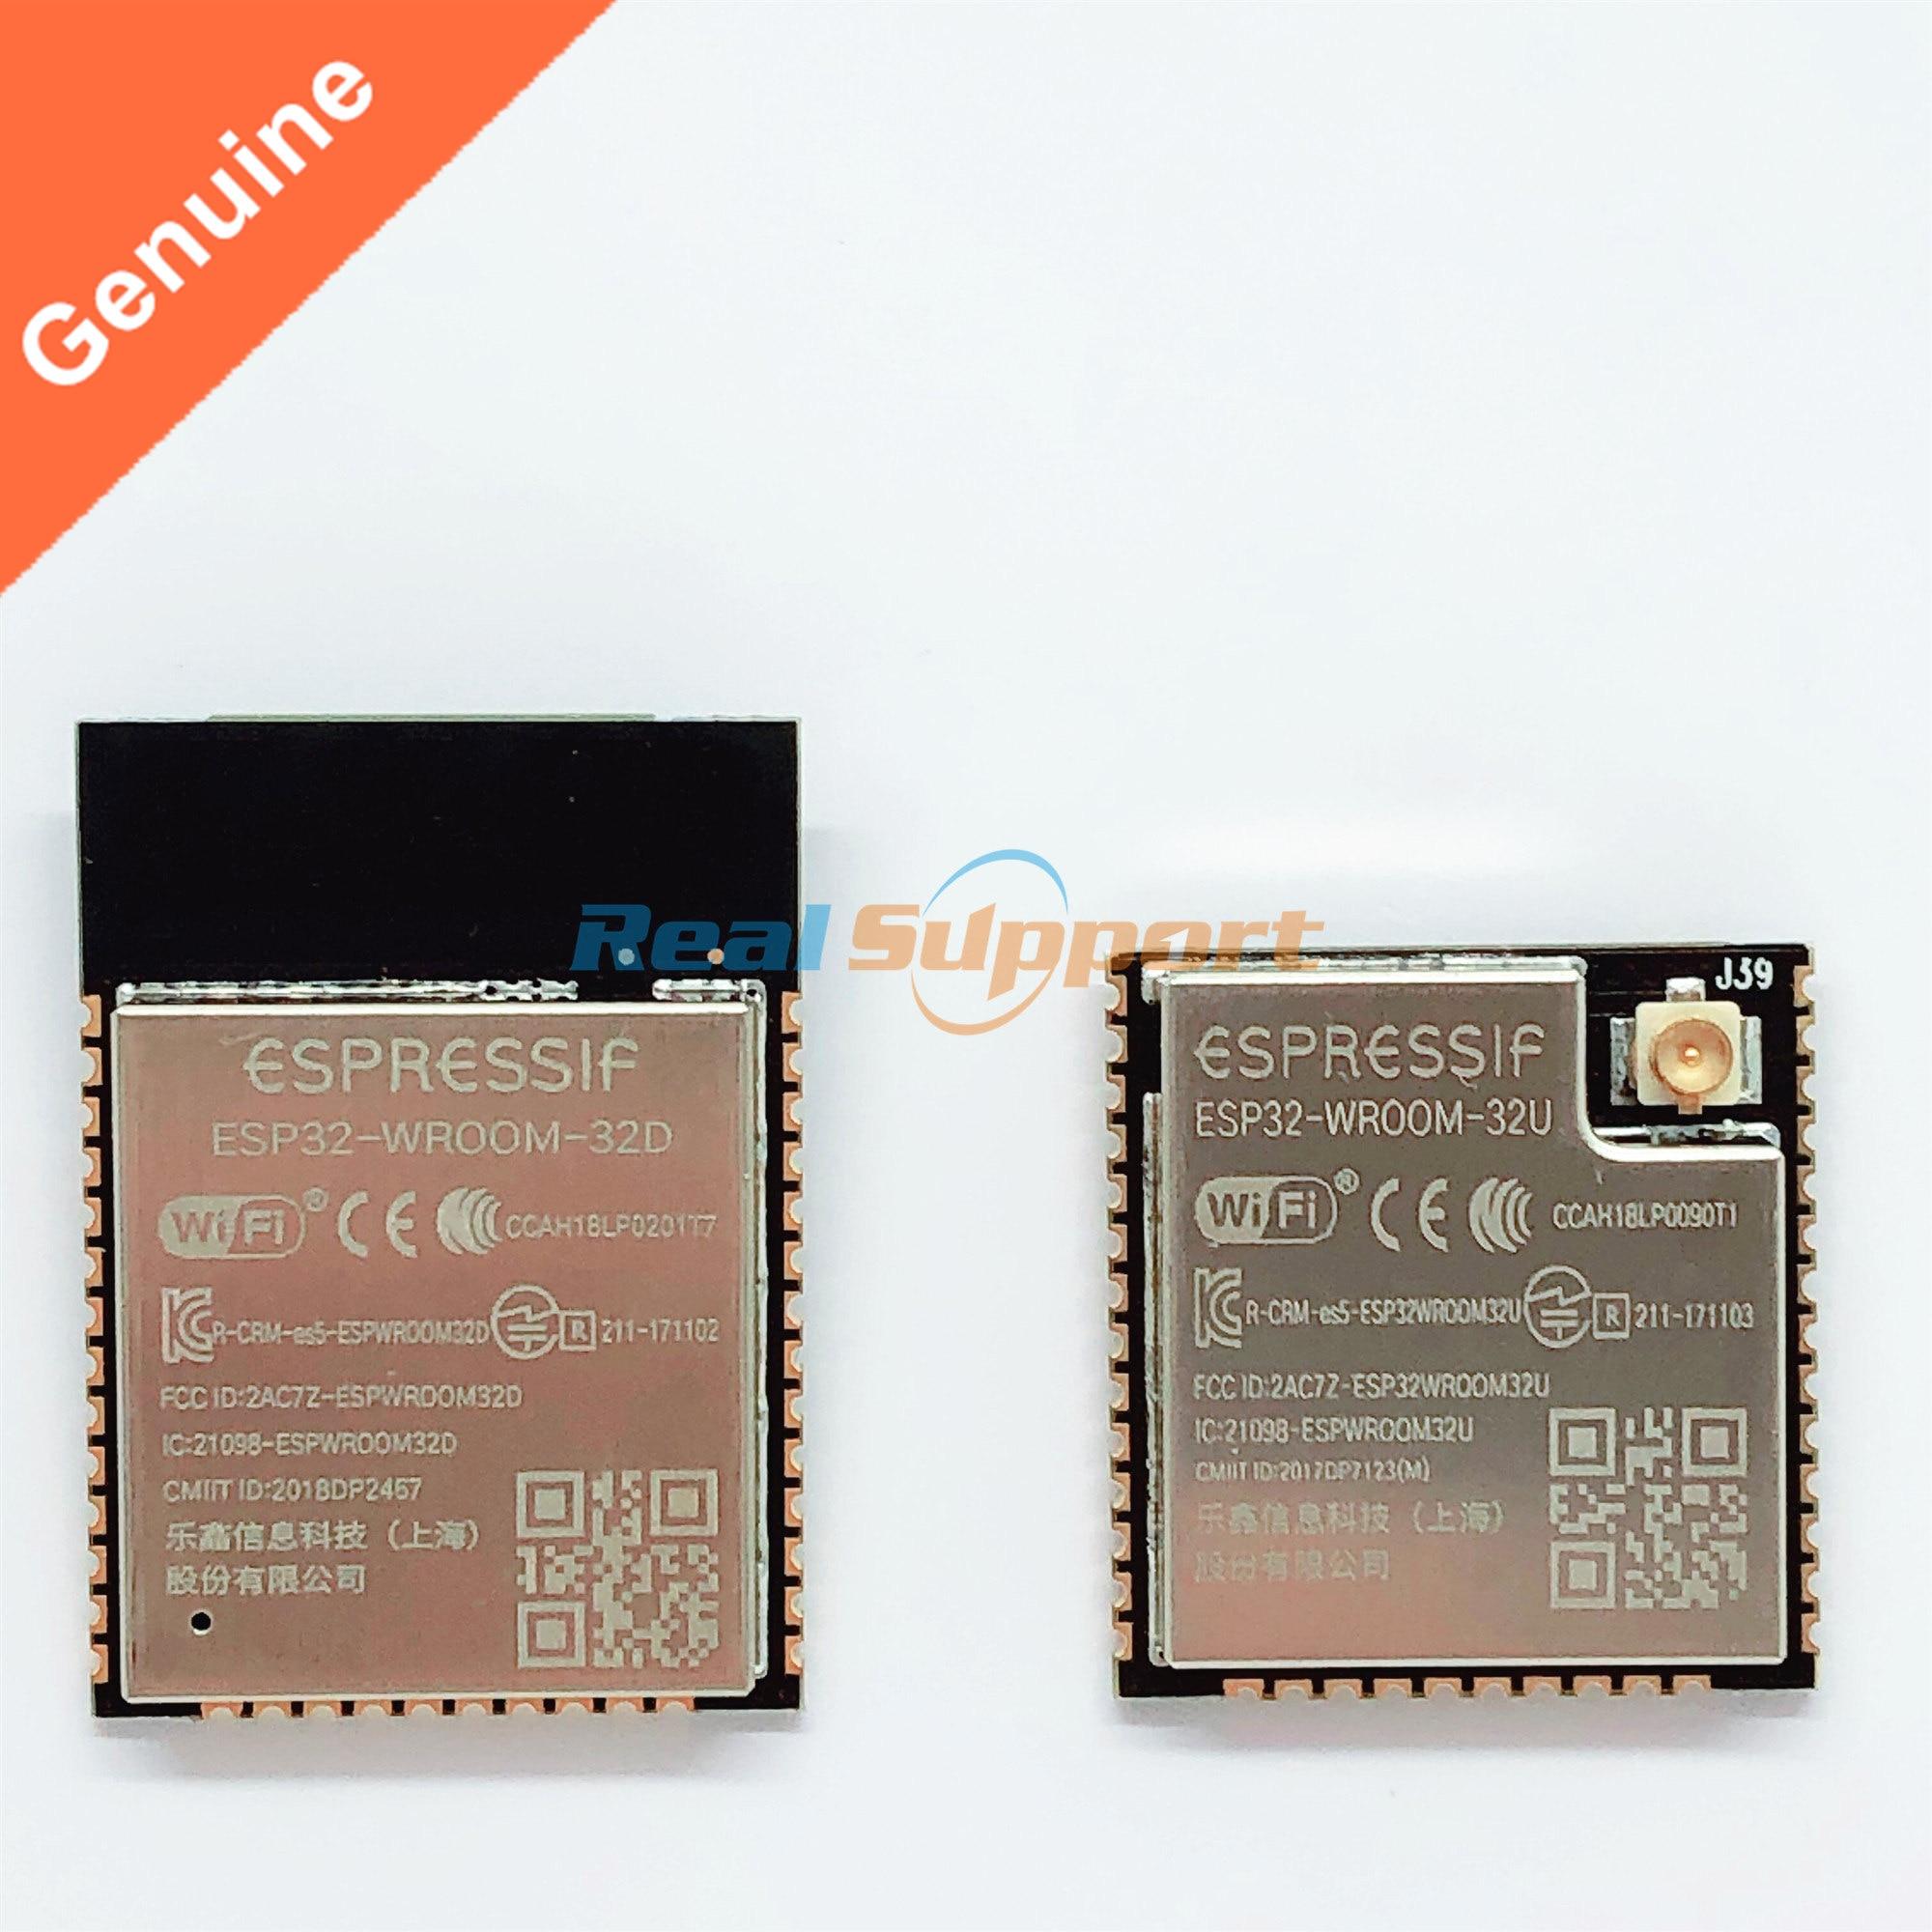 US $2 88  ESP32 WROOM 32D ESP32 WROOM 32U WiFi+BT+BLE ESP32 Module onboard  antenna / U FL IPEX IPX connector 4MB Flash Espressif Original-in